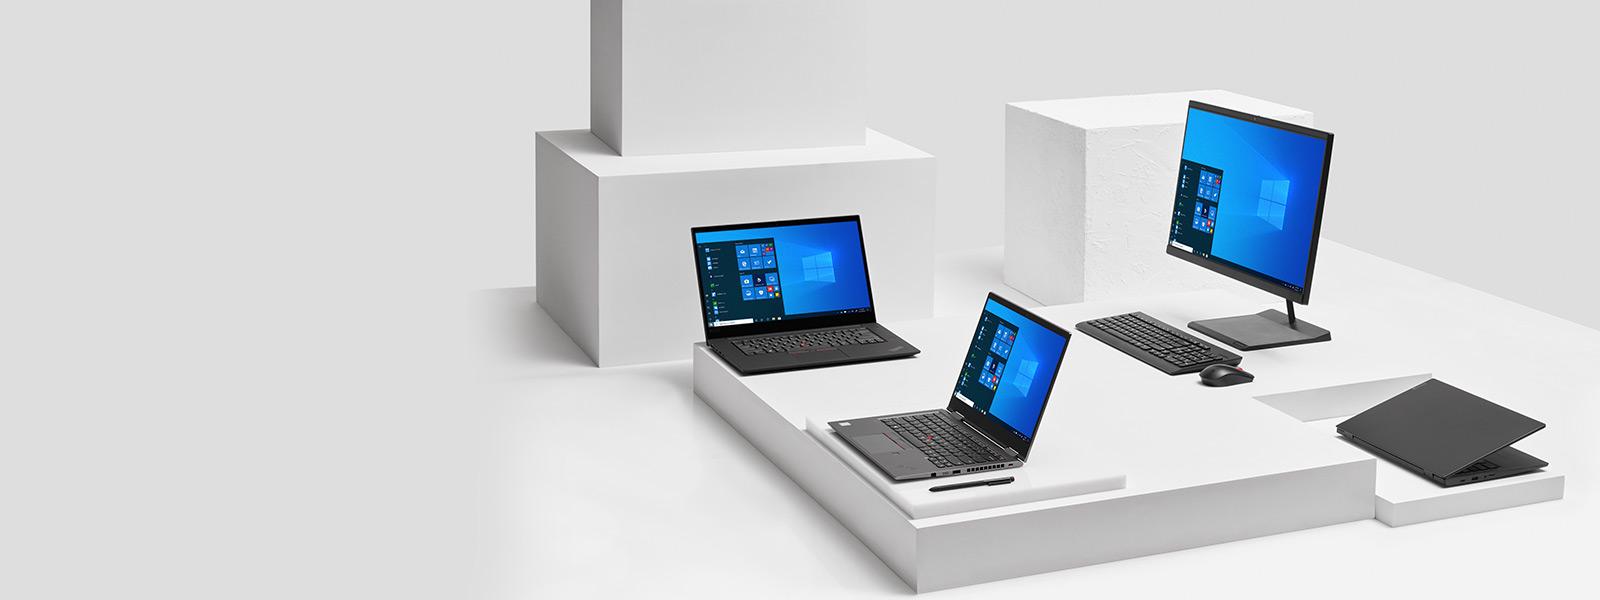 Lenovo 裝置系列顯示 Windows 10 專業版的開始畫面